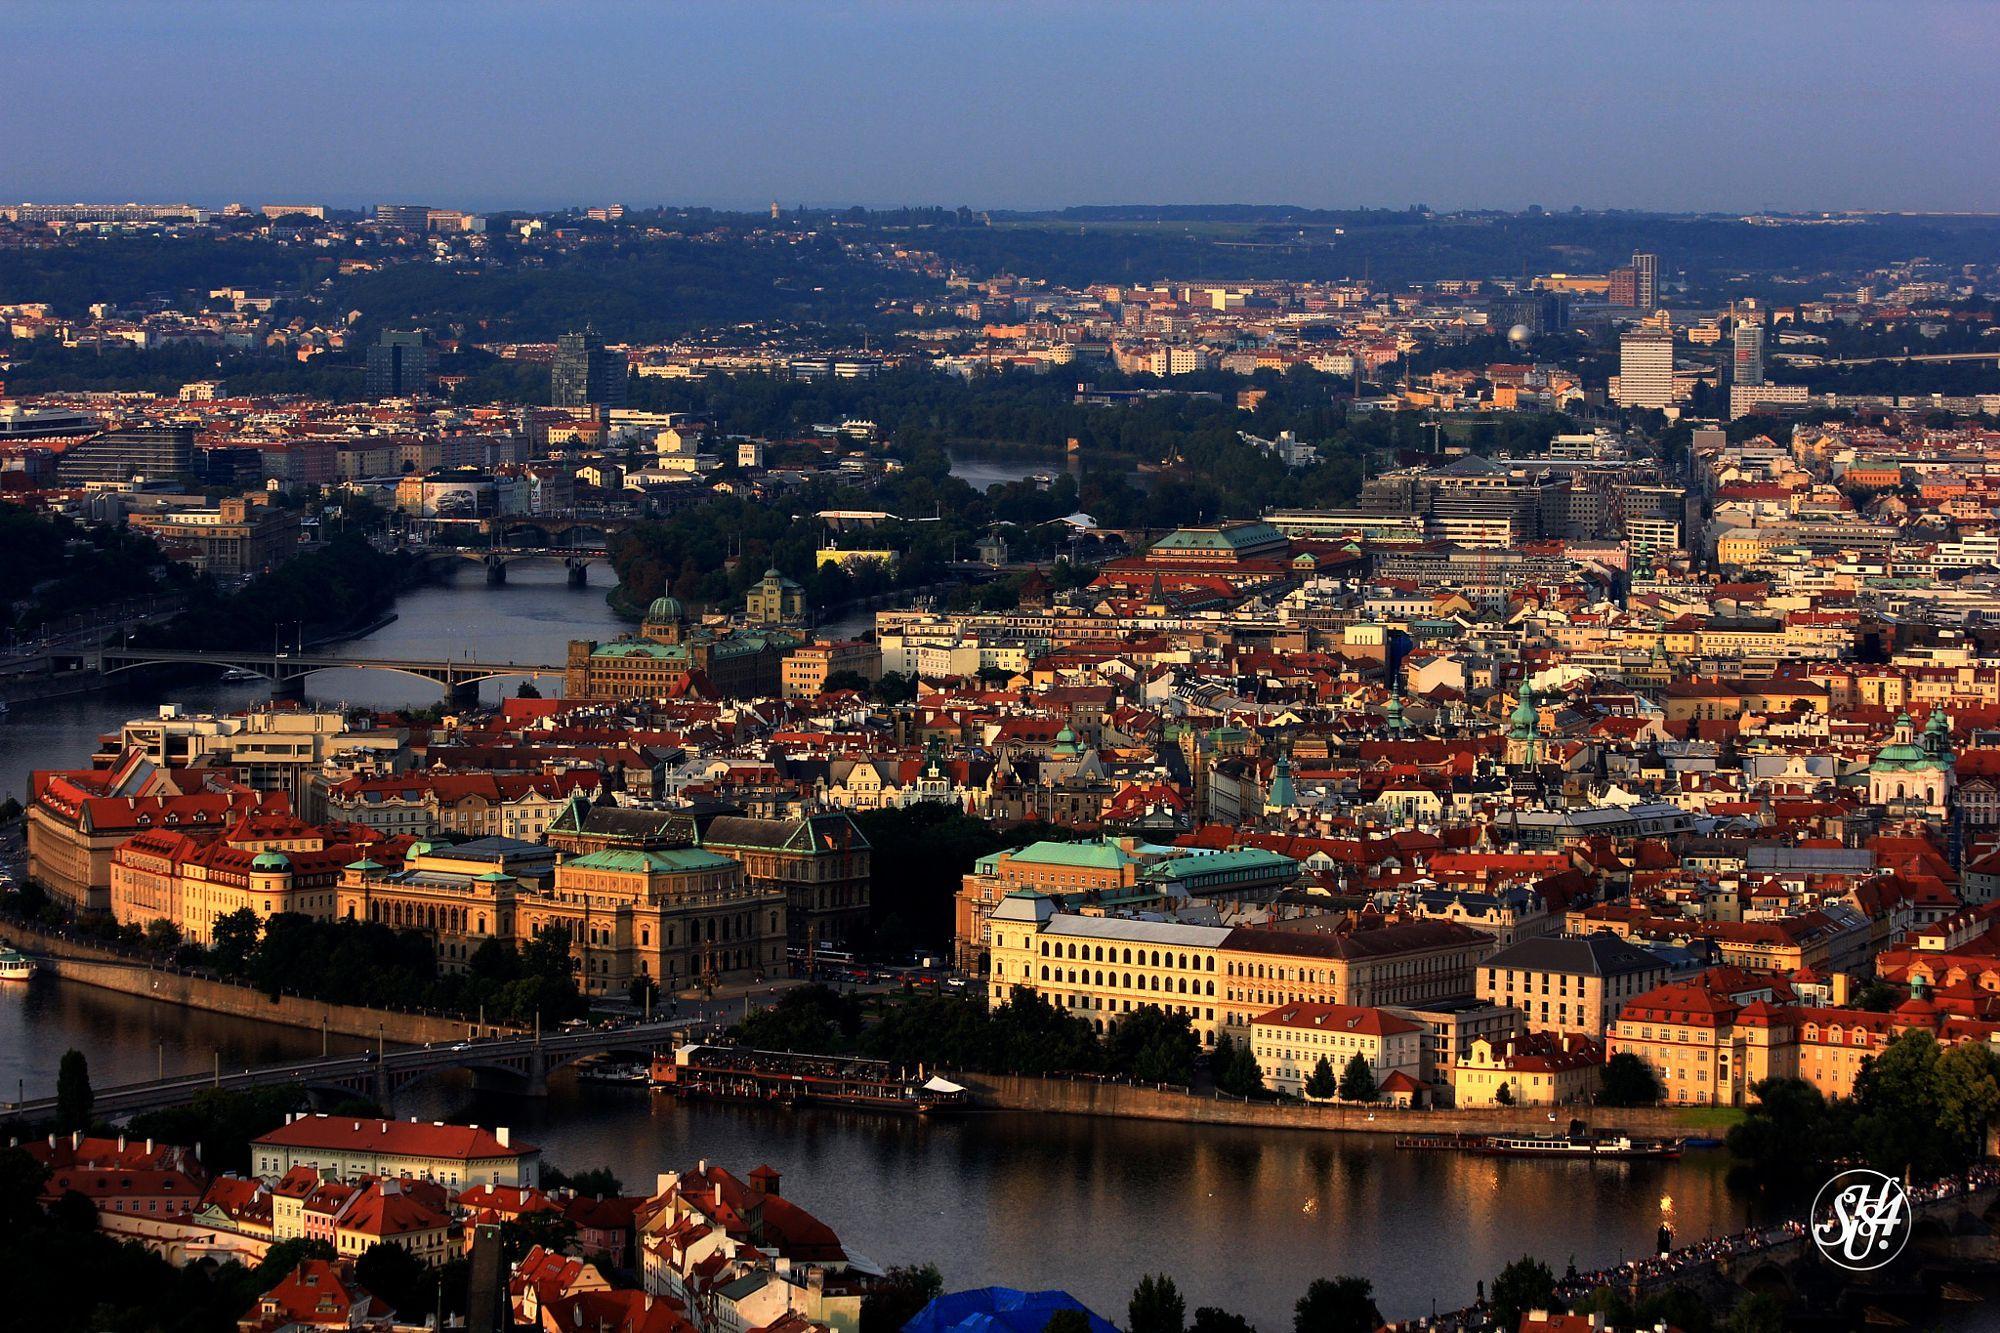 panorama by Shorena Beruashvili on 500px